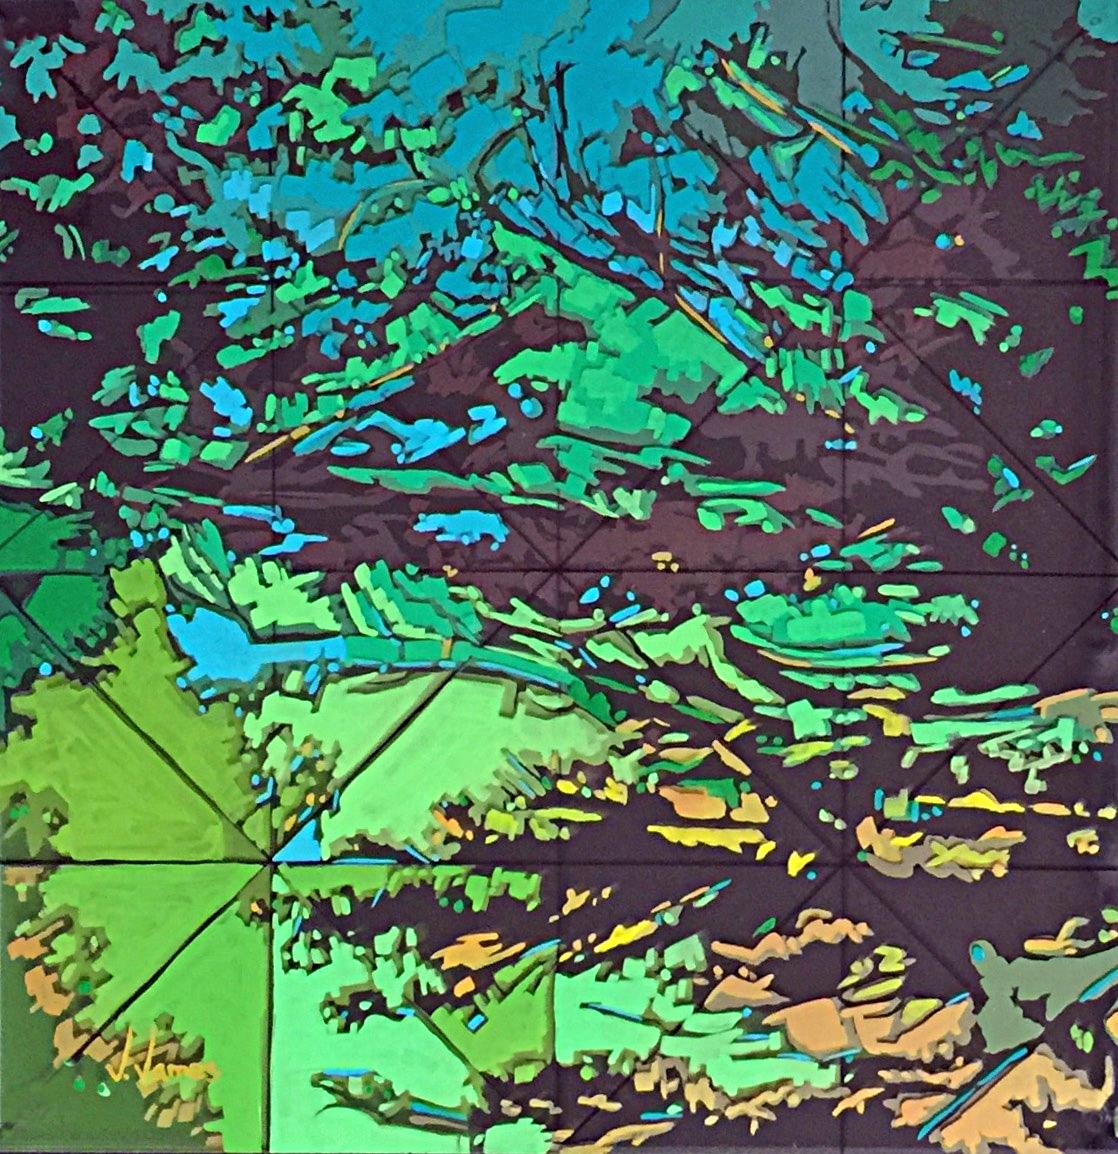 "Robin's Egg, 16"" x 16"" Acrylic on Multi-Layered Acrylic Glass"